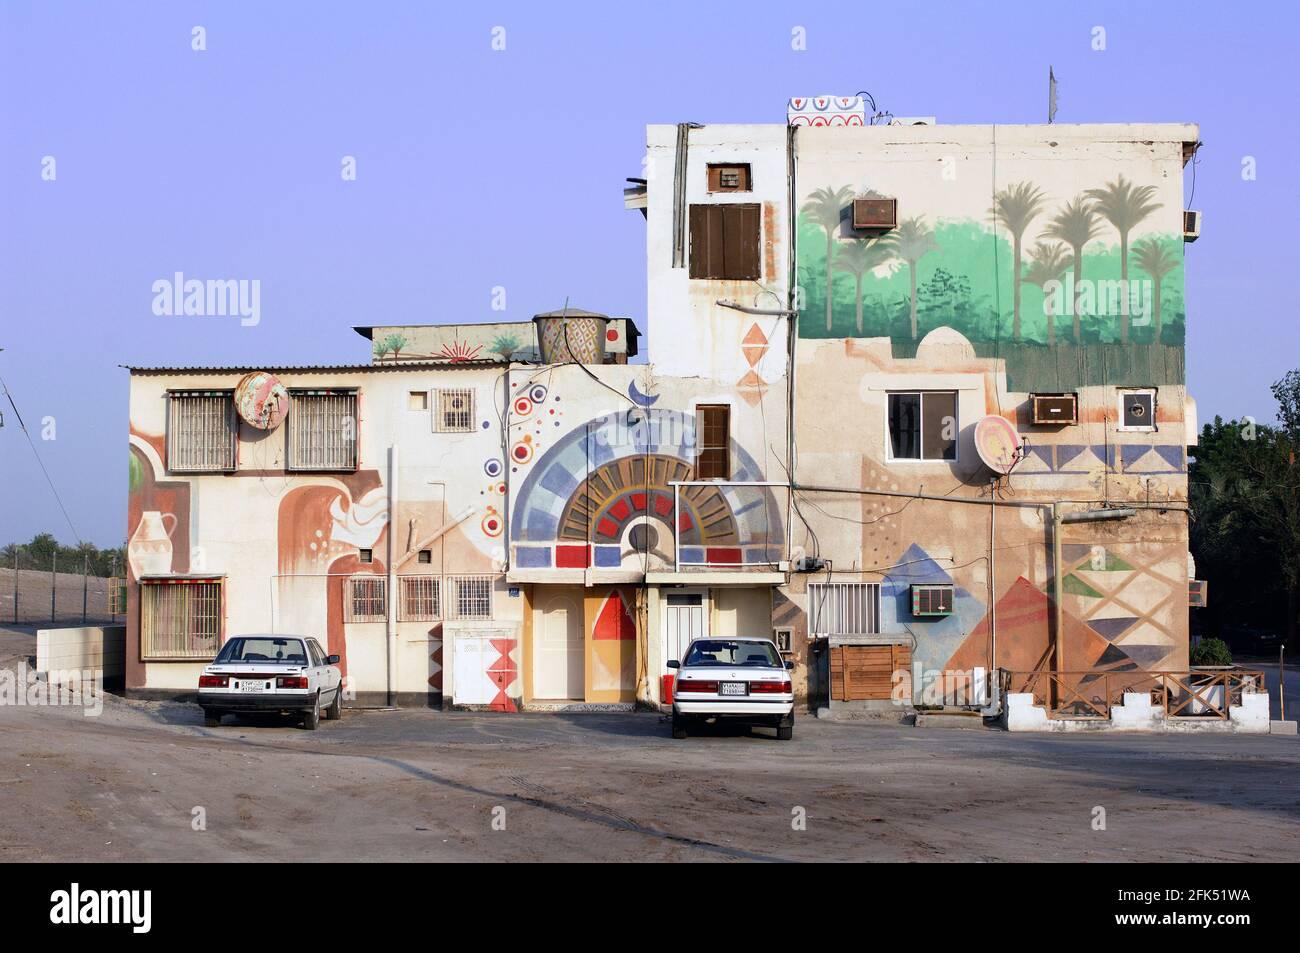 Naher Osten, Persischer Golf, Arabische Halbinsel, Bahrain, Manama, Haus, Stockfoto